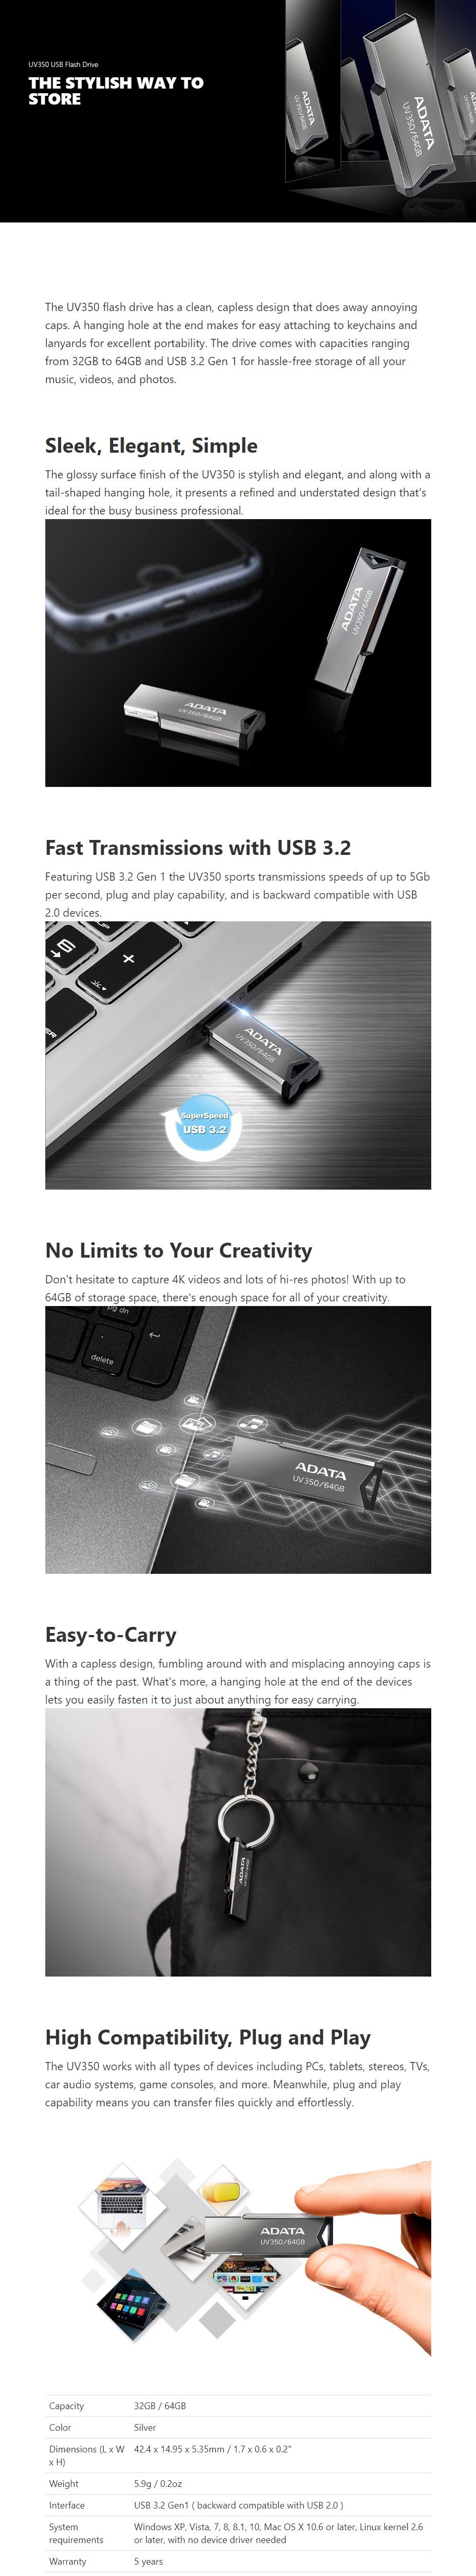 ADATA 64GB UV350 USB 3.2 Flash Drive - Silver - Overview 1